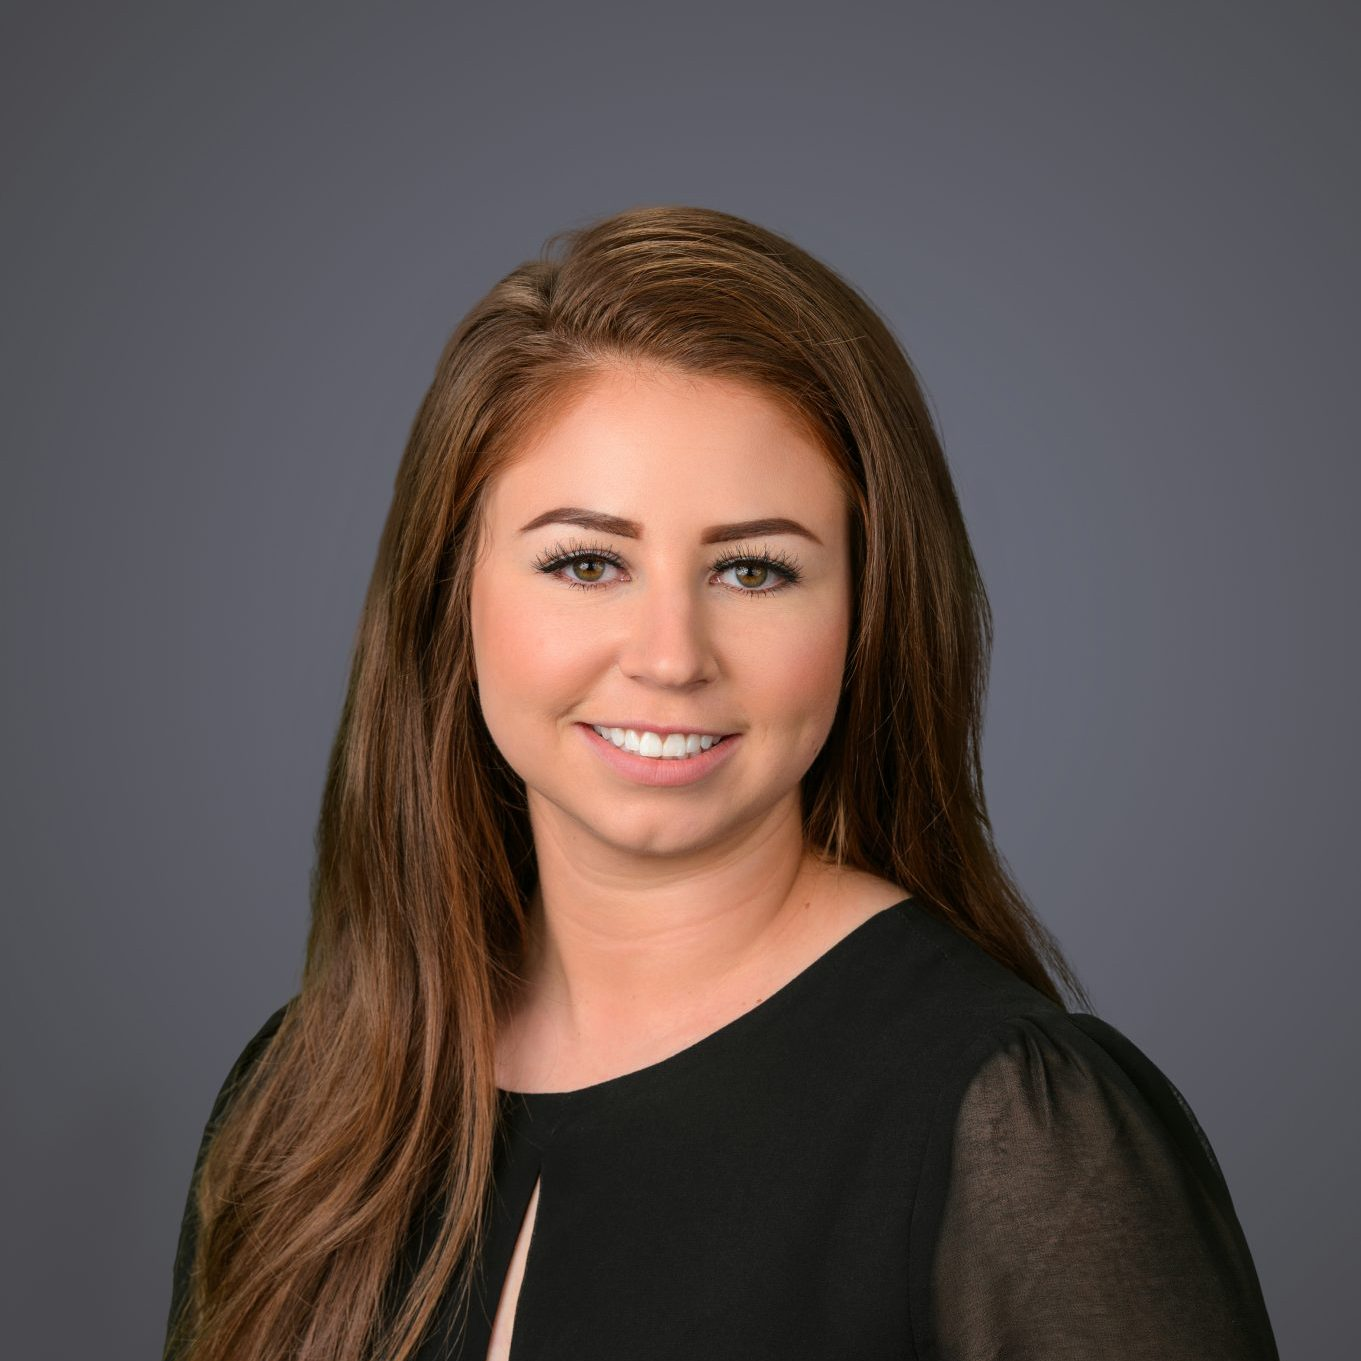 Megan French